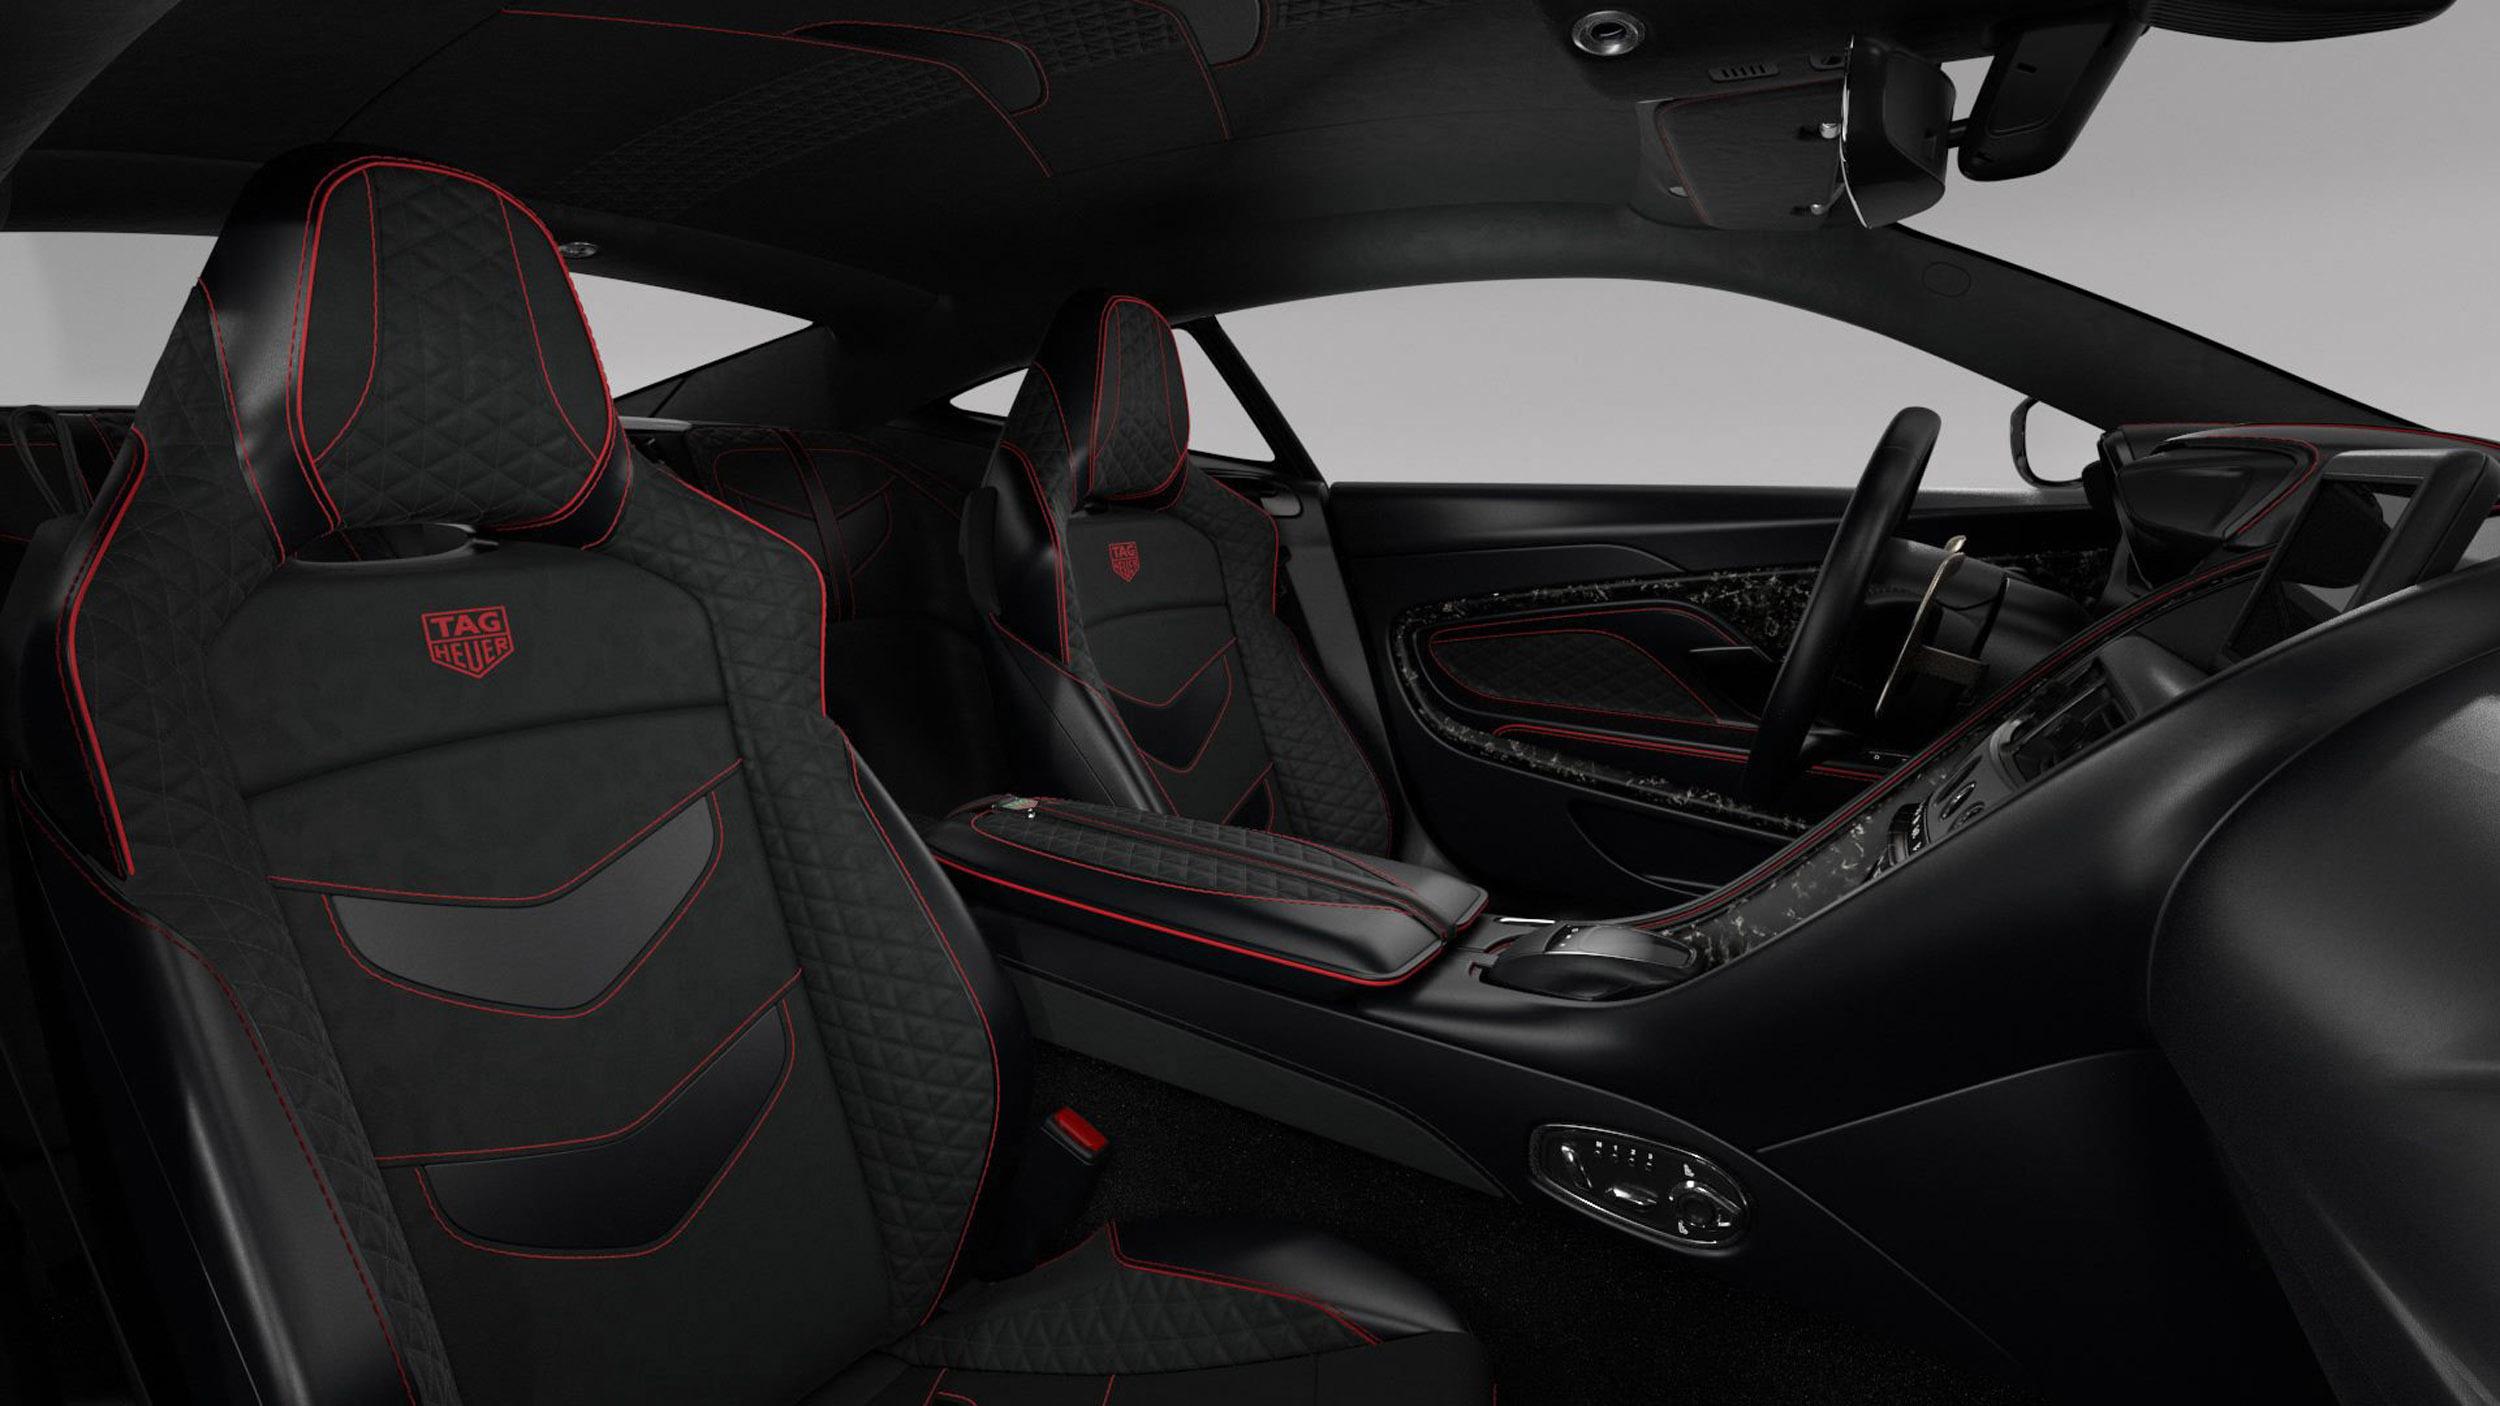 Aston Martin DBS Superleggera Tag Heuer Edition (4)